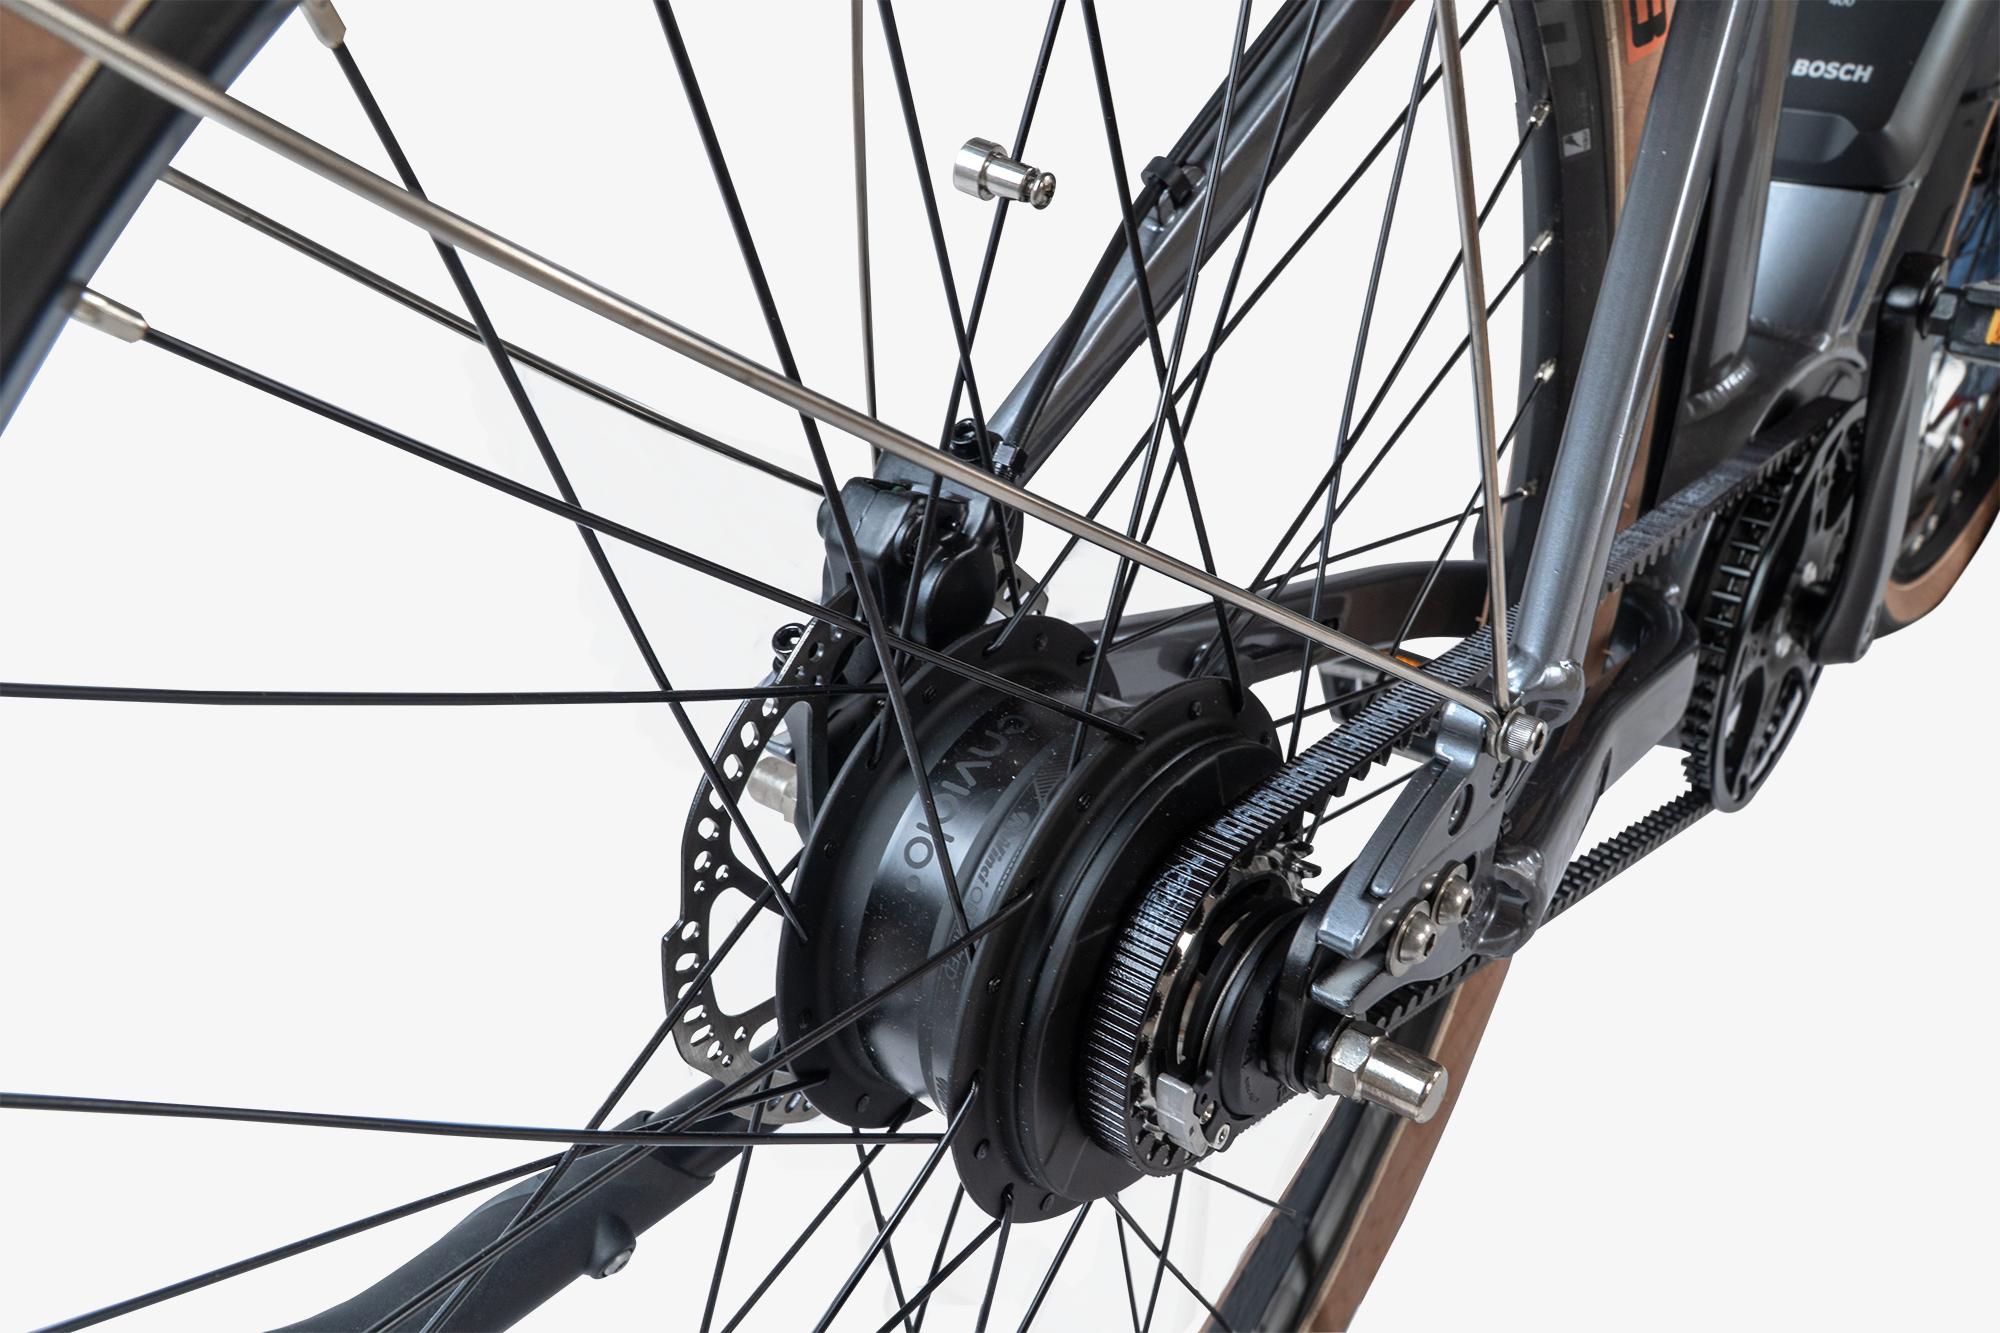 Enviolo N3780 rear hub on the Priority Embark electric bike